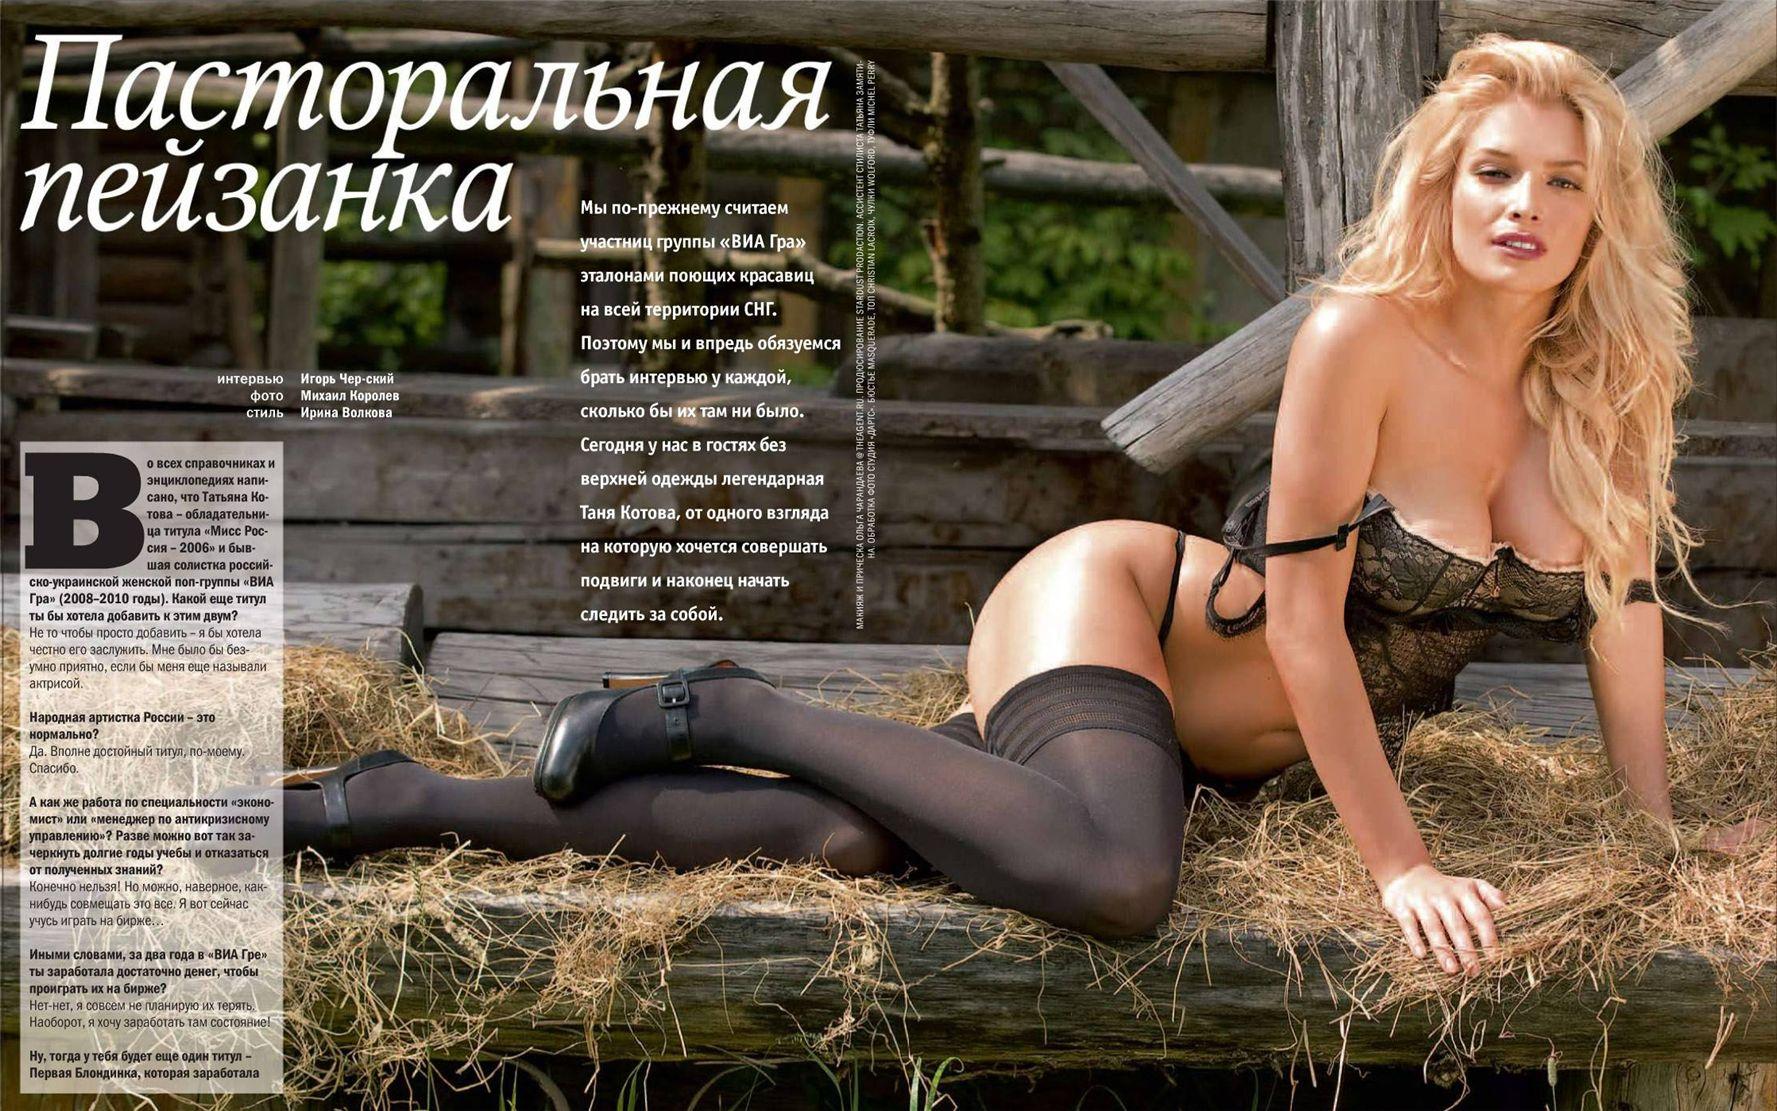 Южно-сахалинск новая виа гра голые